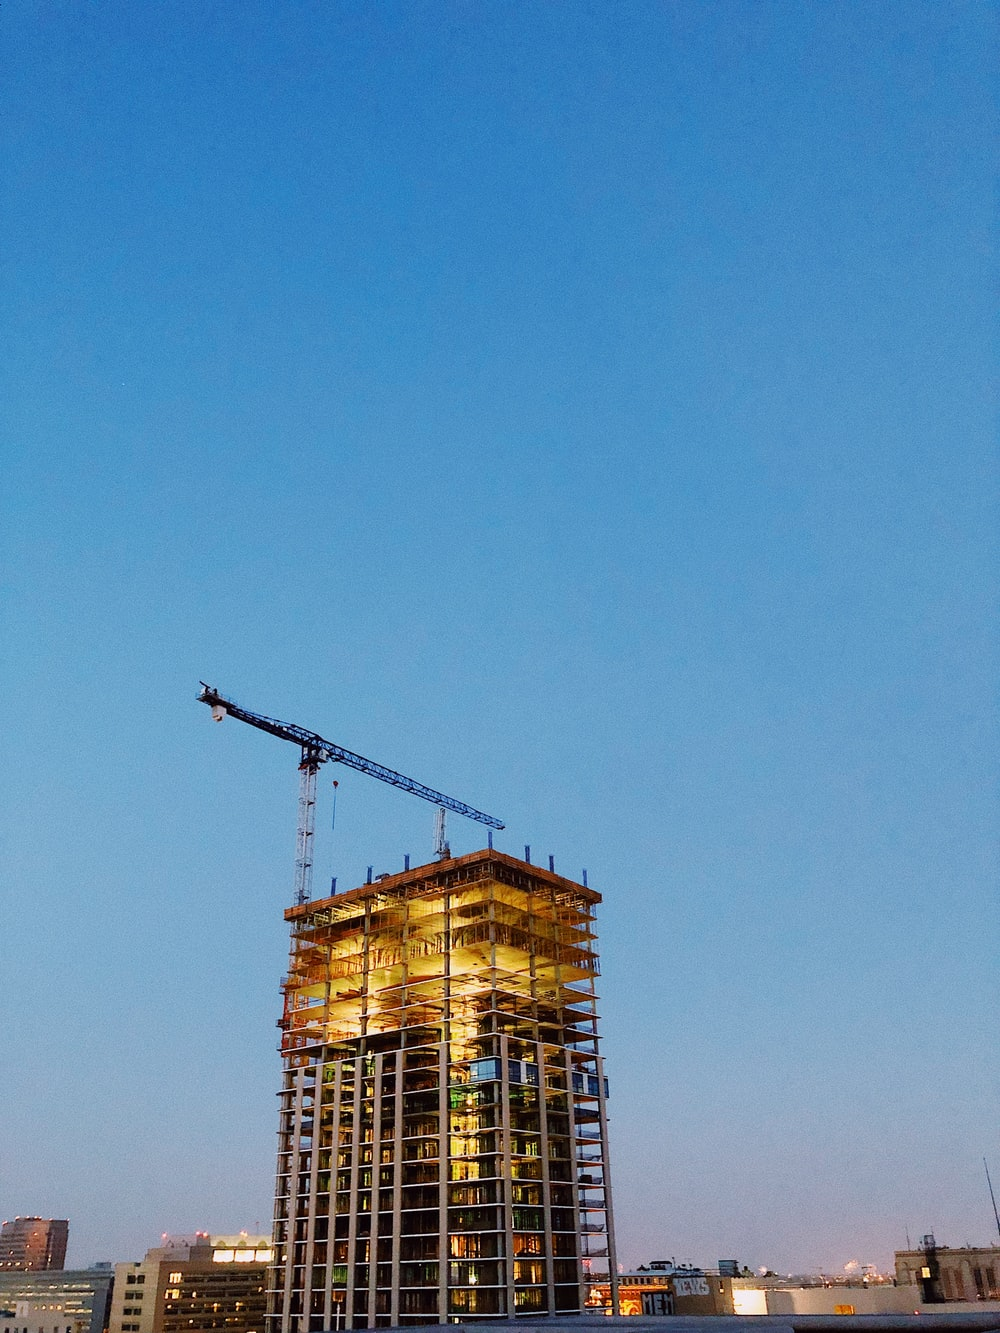 gray crane on building